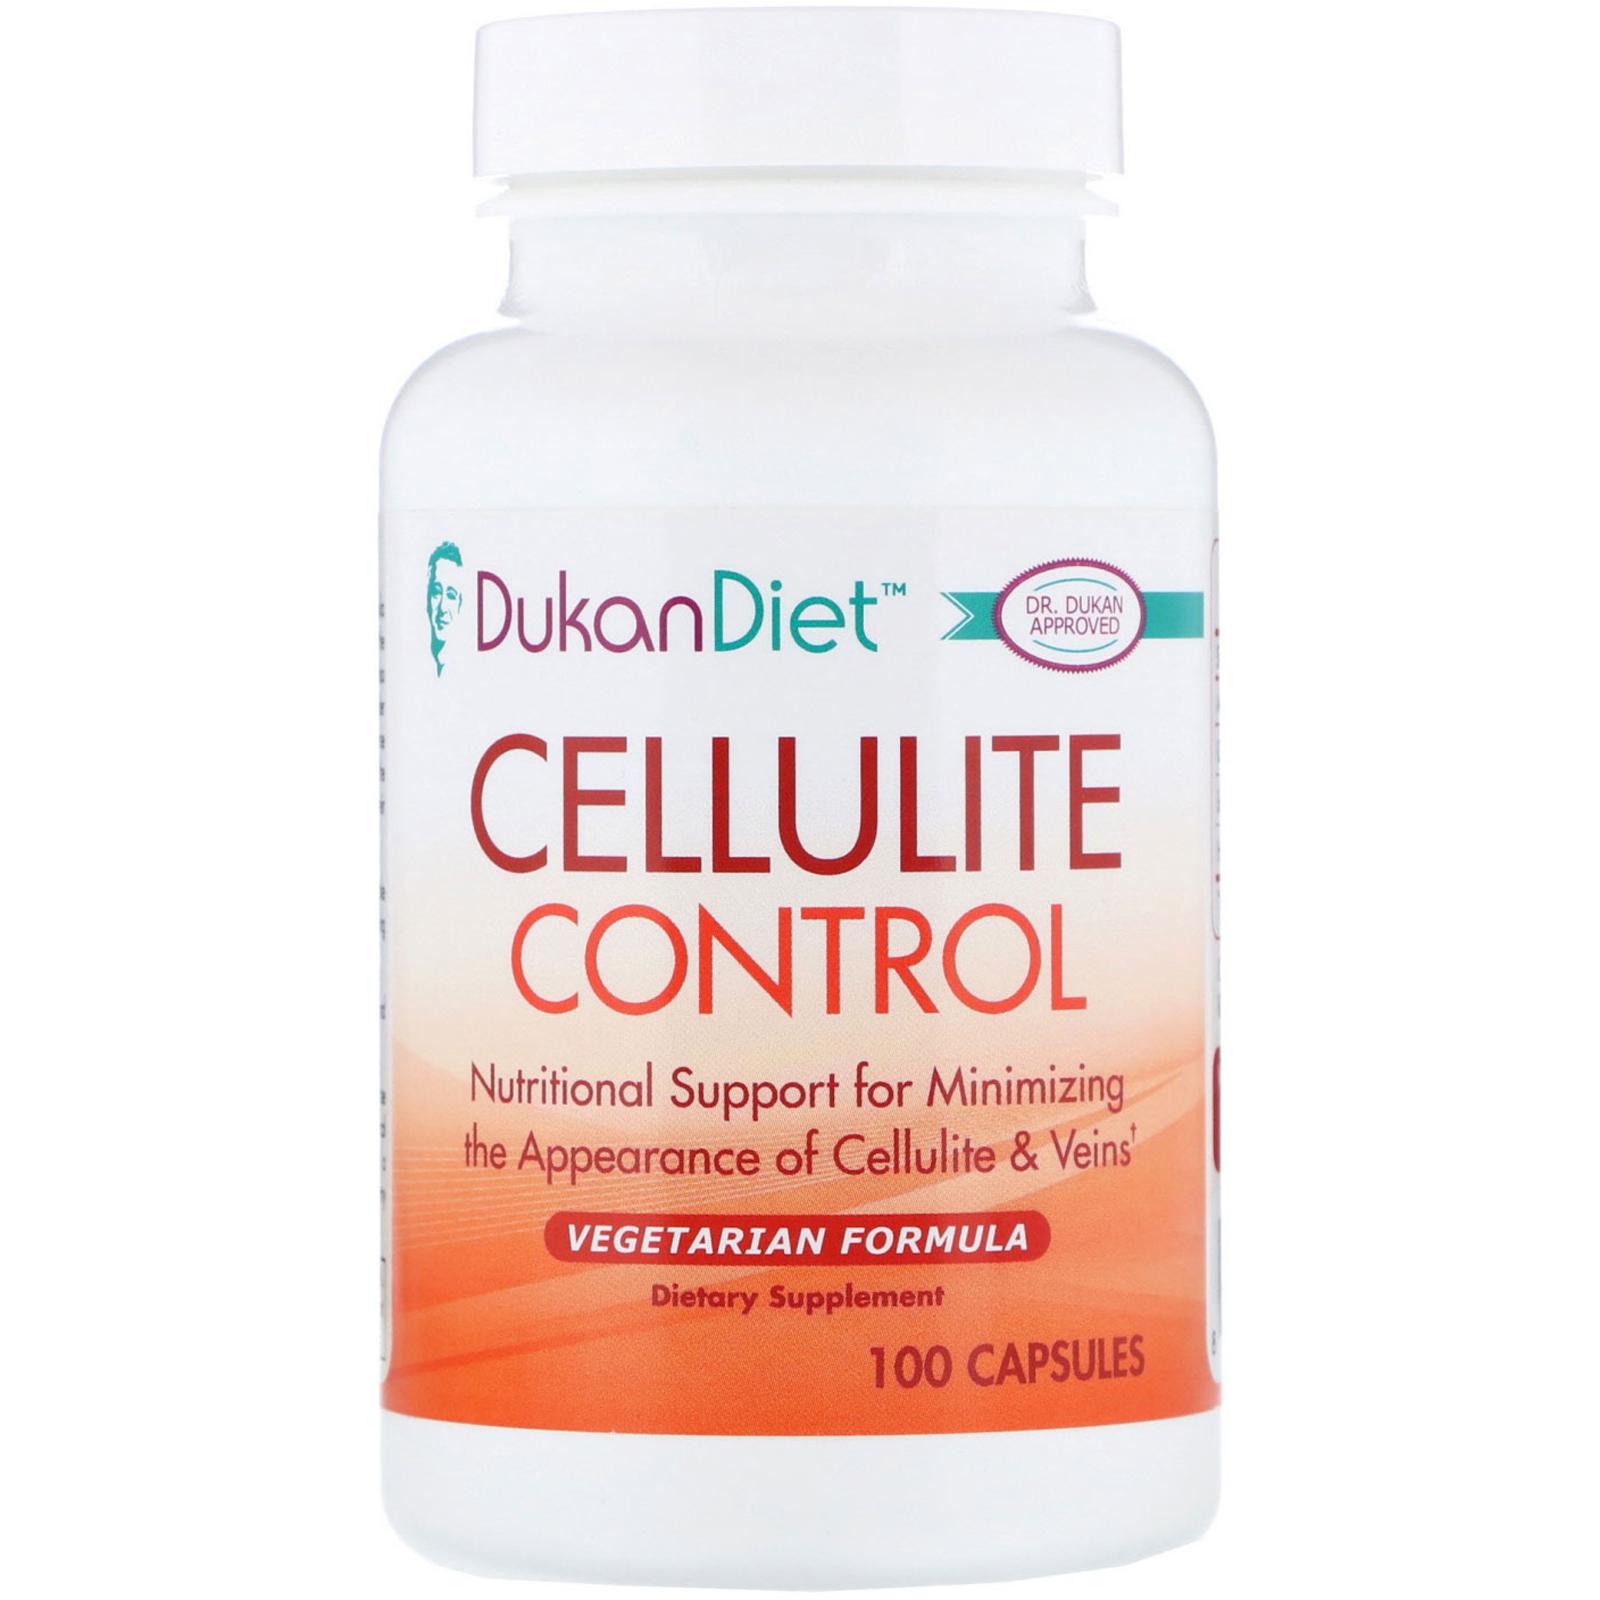 Dukan diet cellulite control reviews